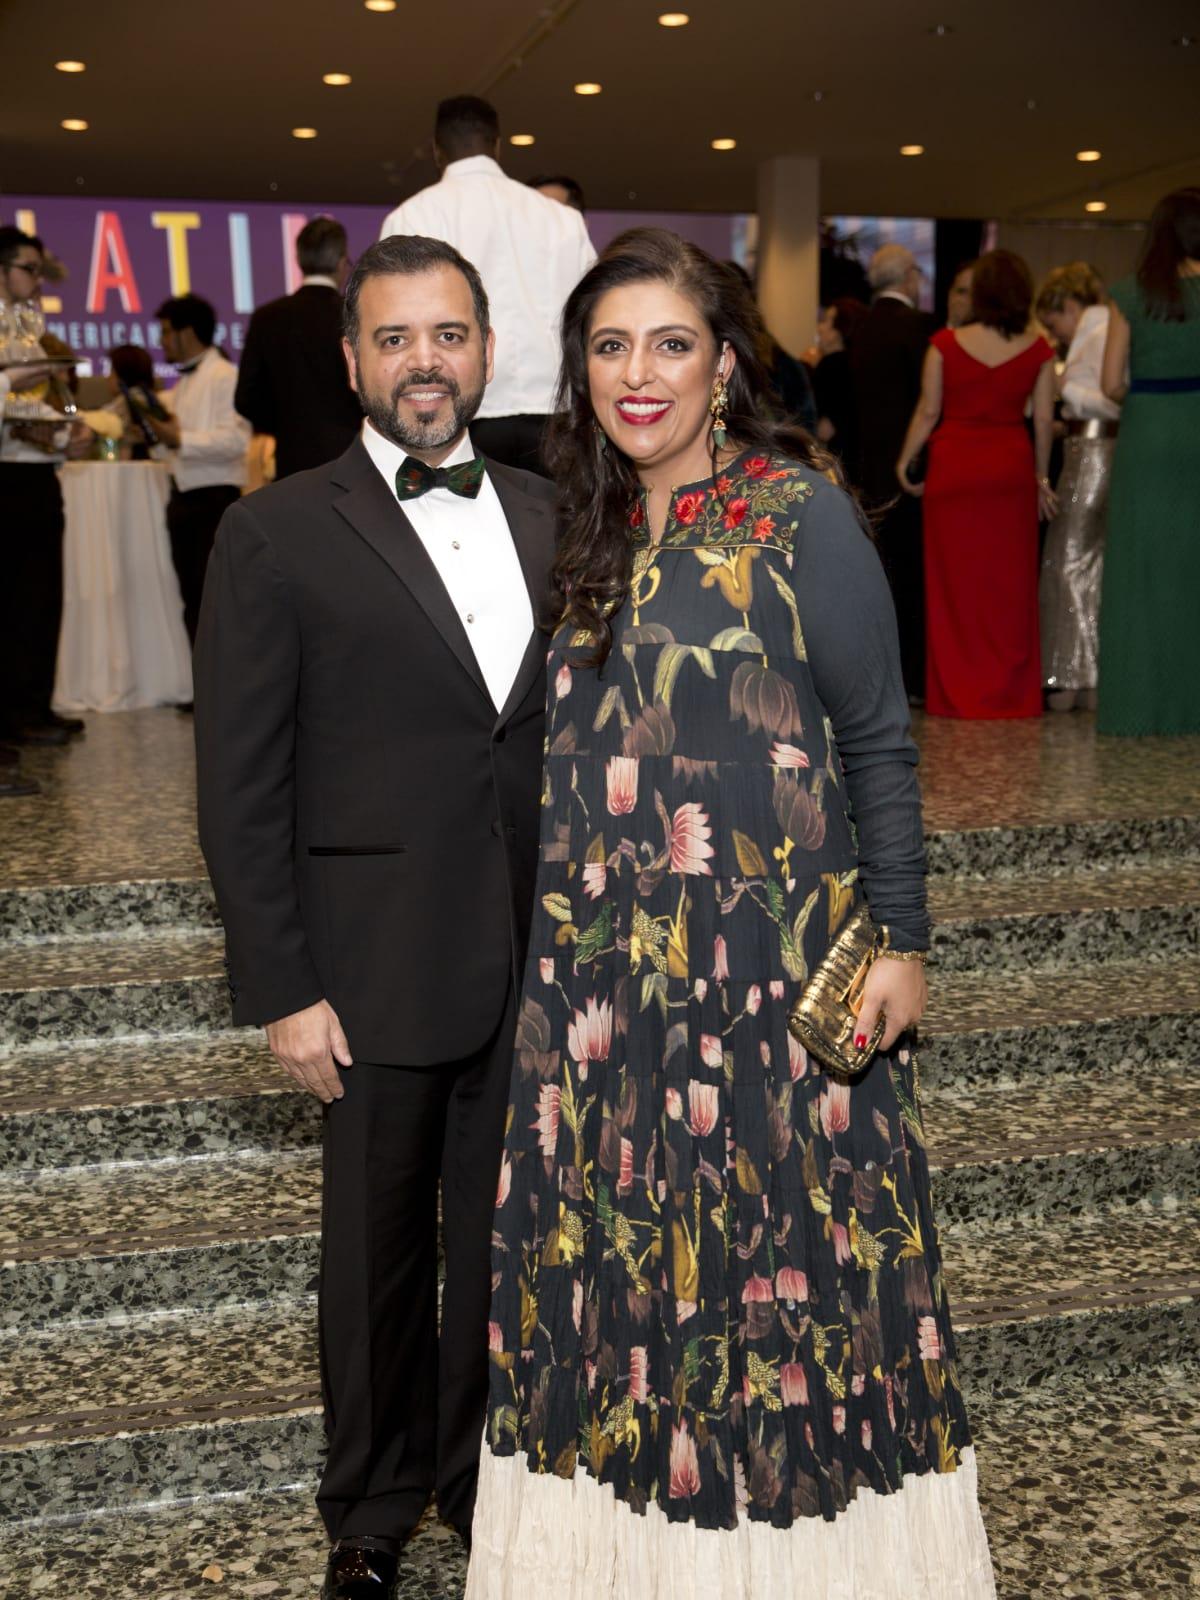 Pershant Mehta, Nidhika Mehta at Latin American Experience